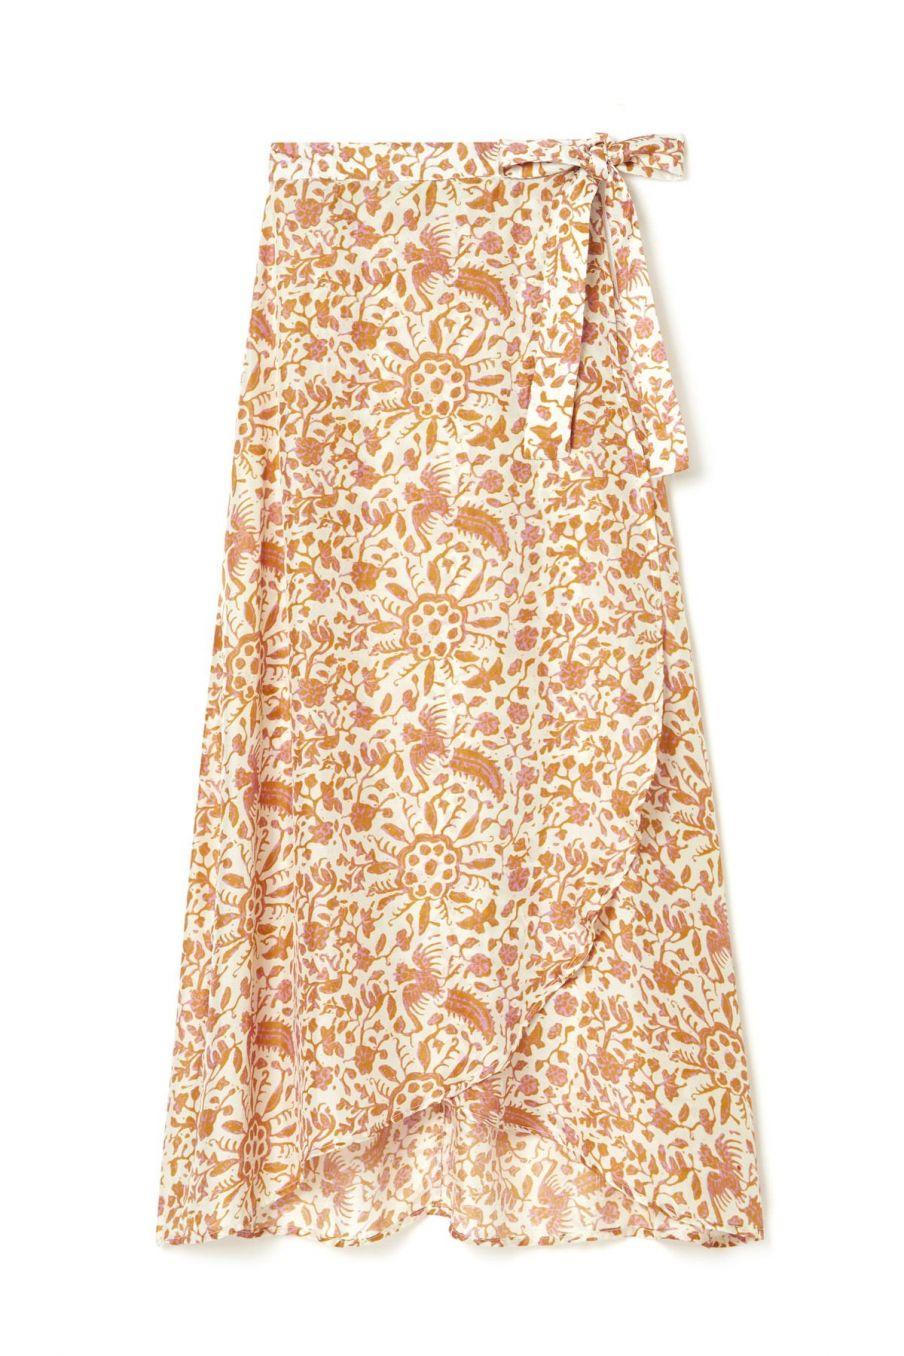 boheme chic vintage jupe femme lucia cream joshua flowers